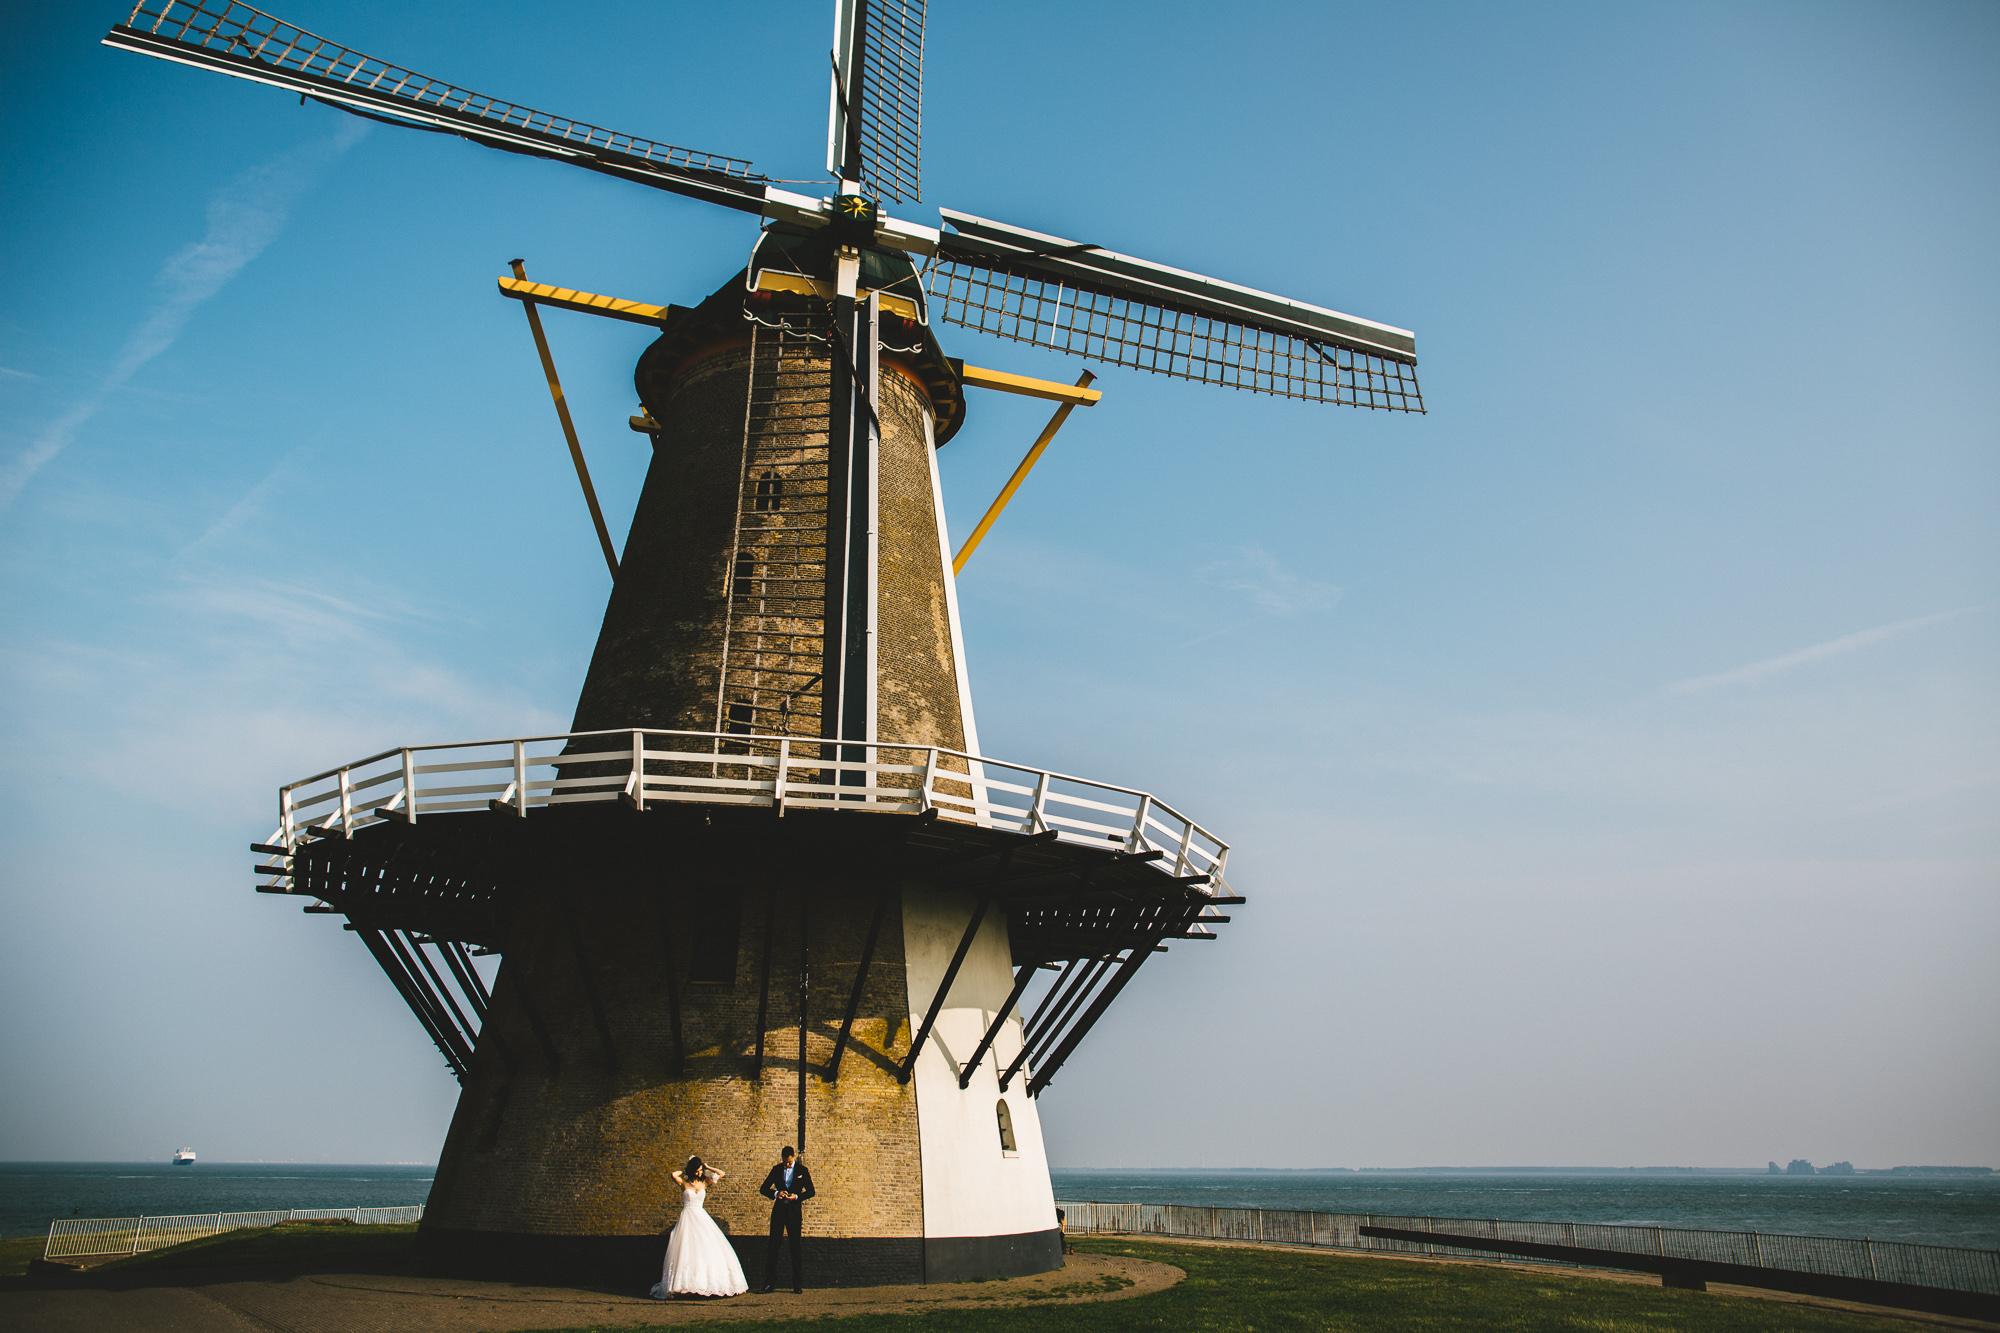 after wedding ia 009 - Afterwedding in Zeeland / Holland